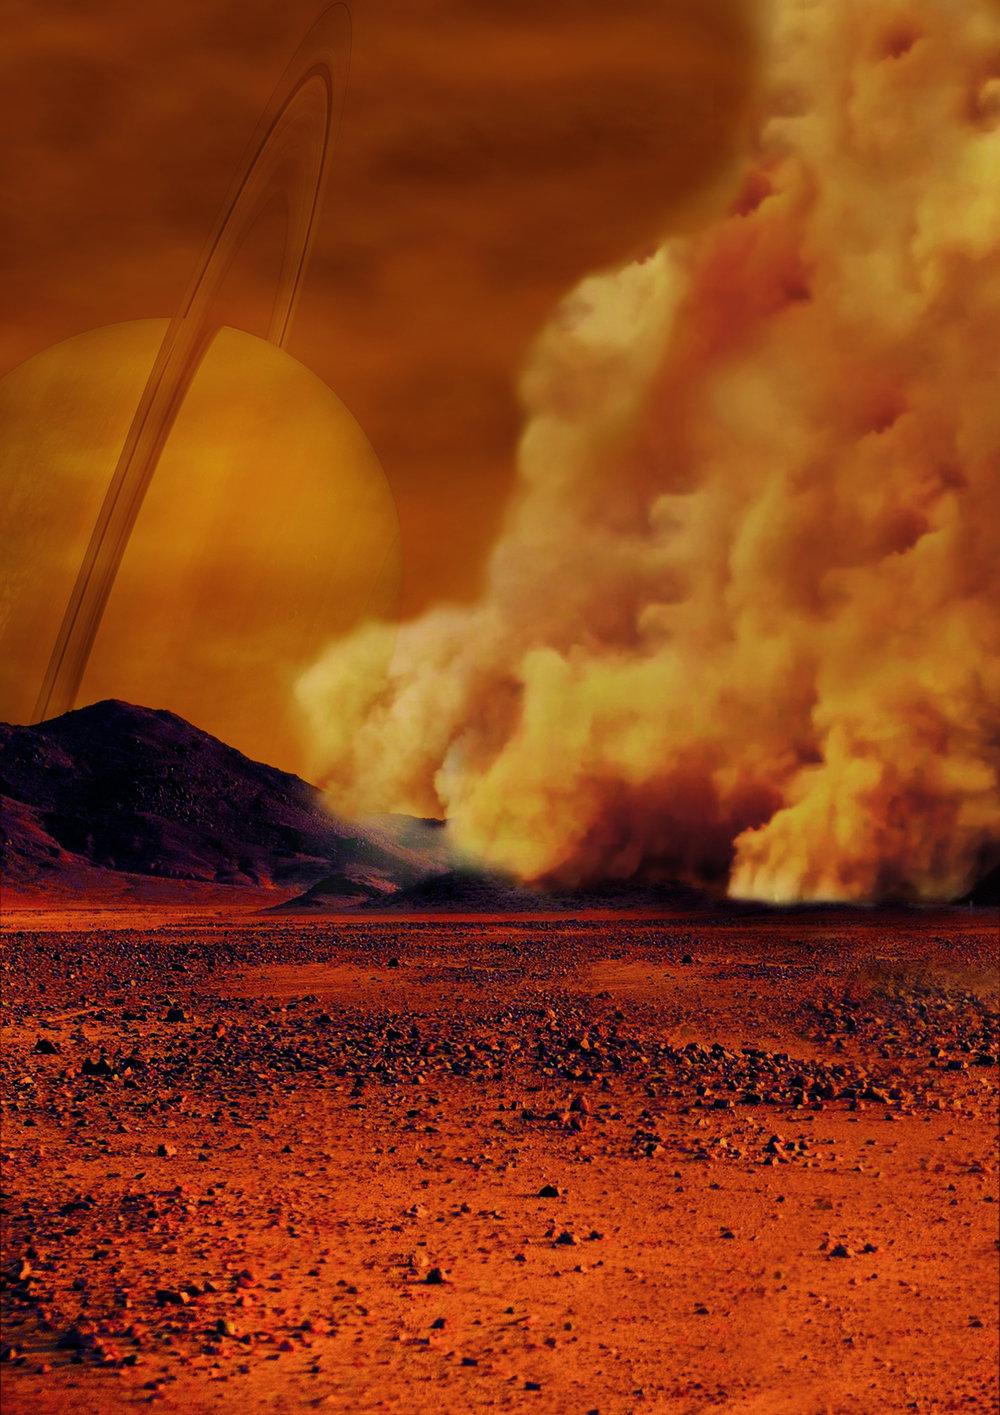 Credit: NASA/ESA/IPGP/Labex UnivEarthS/University Paris Diderot